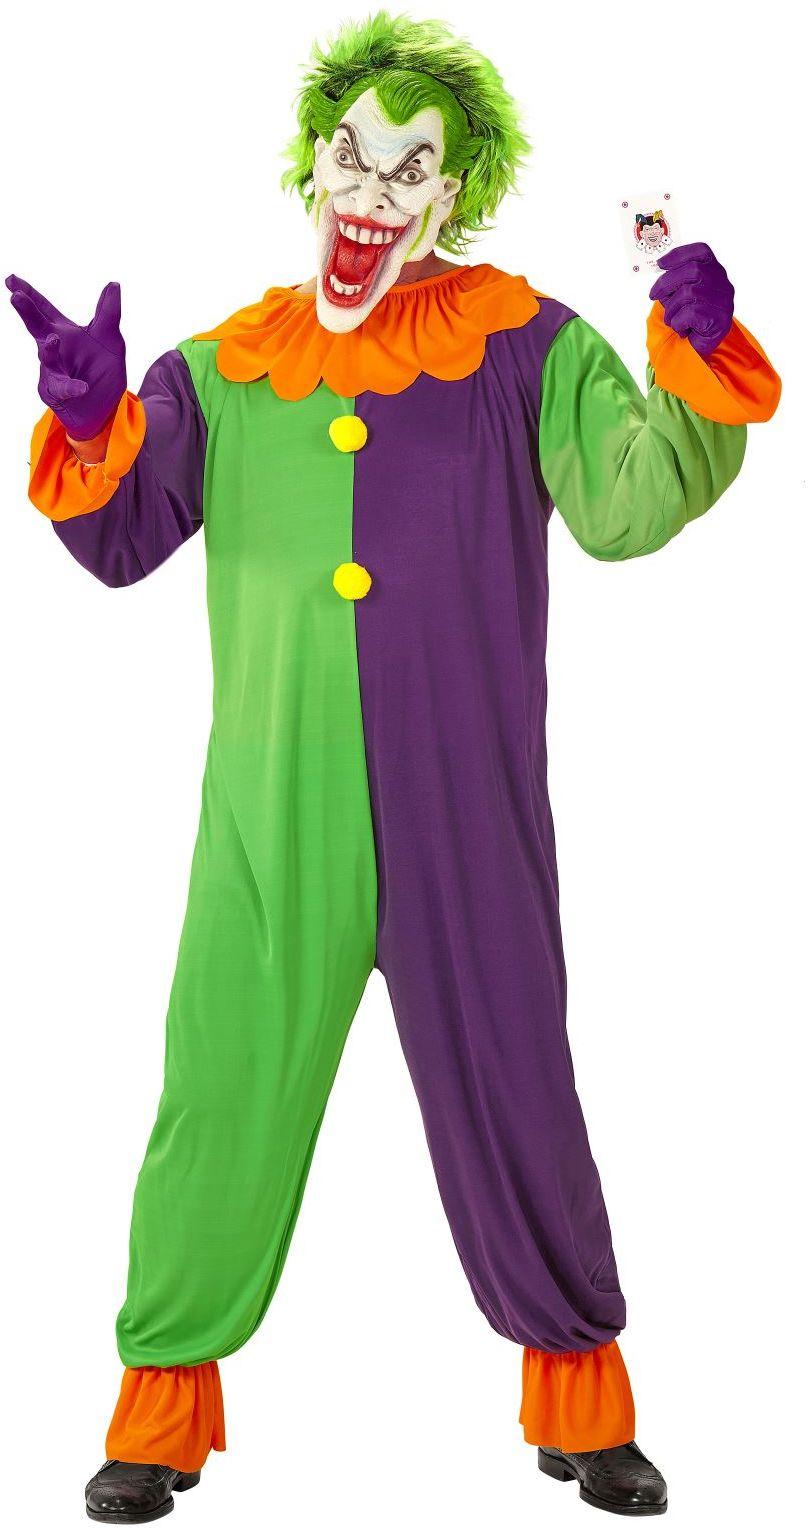 Enge clown kostuum